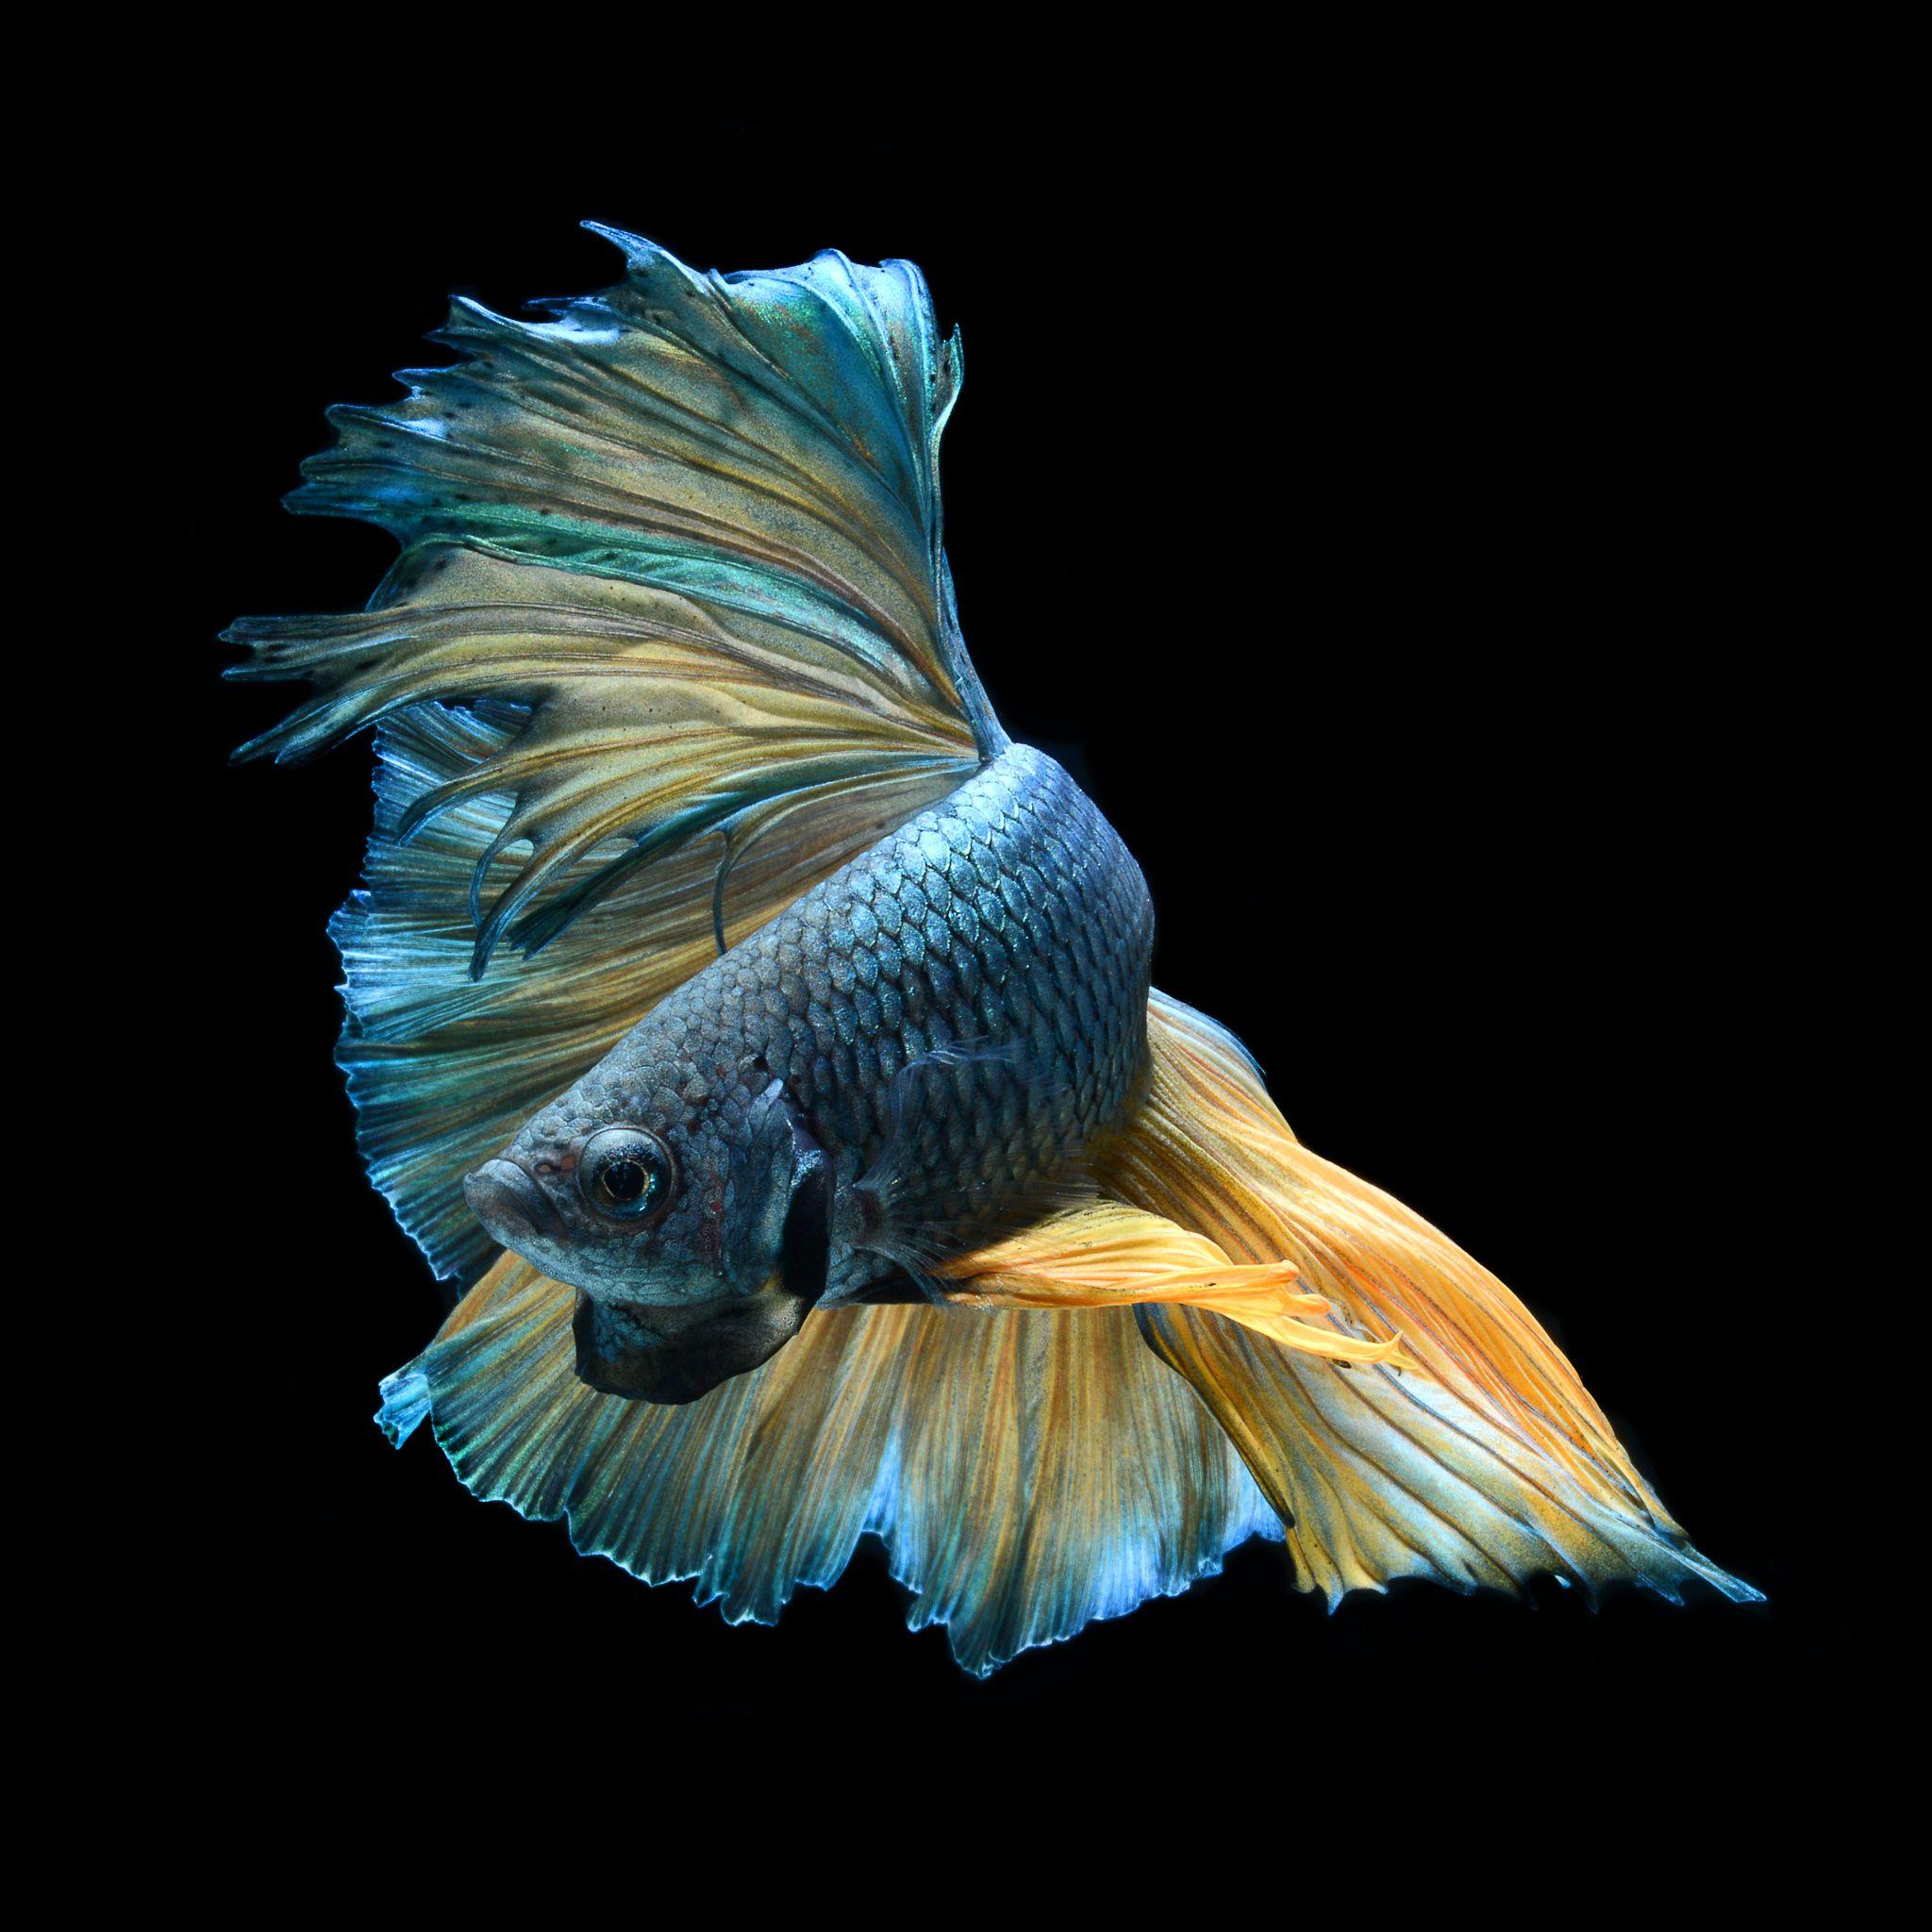 Dsc betta splenden siamese fighting fish my for Why do betta fish fight